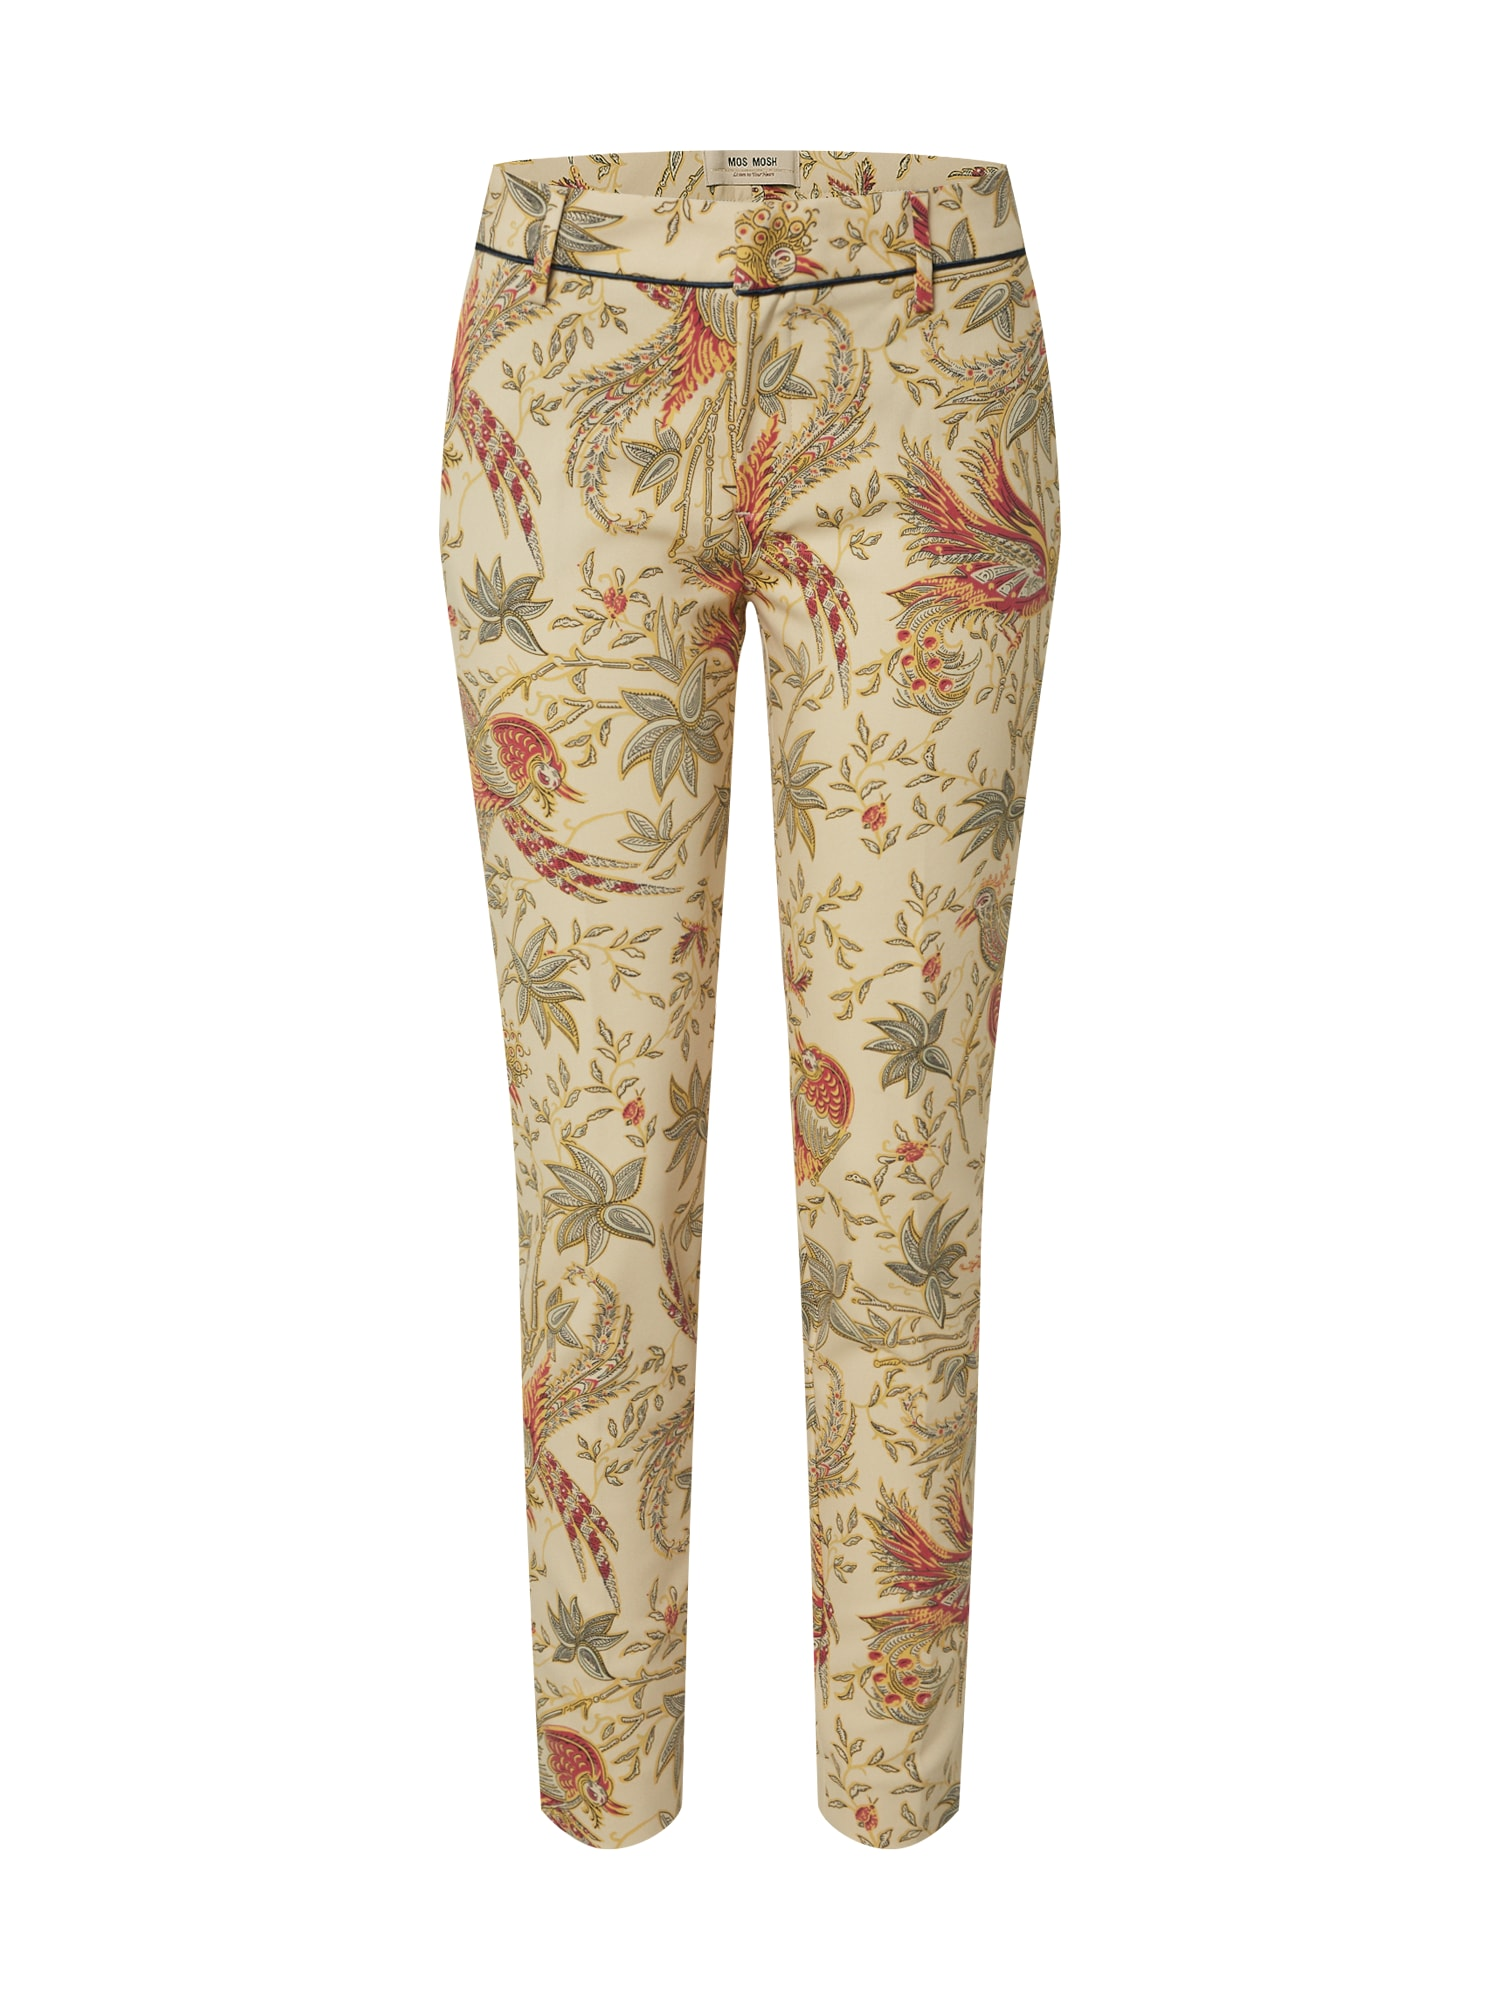 MOS MOSH Klostuotos kelnės 'Abbey Eden' mišrios spalvos / nebalintos drobės spalva